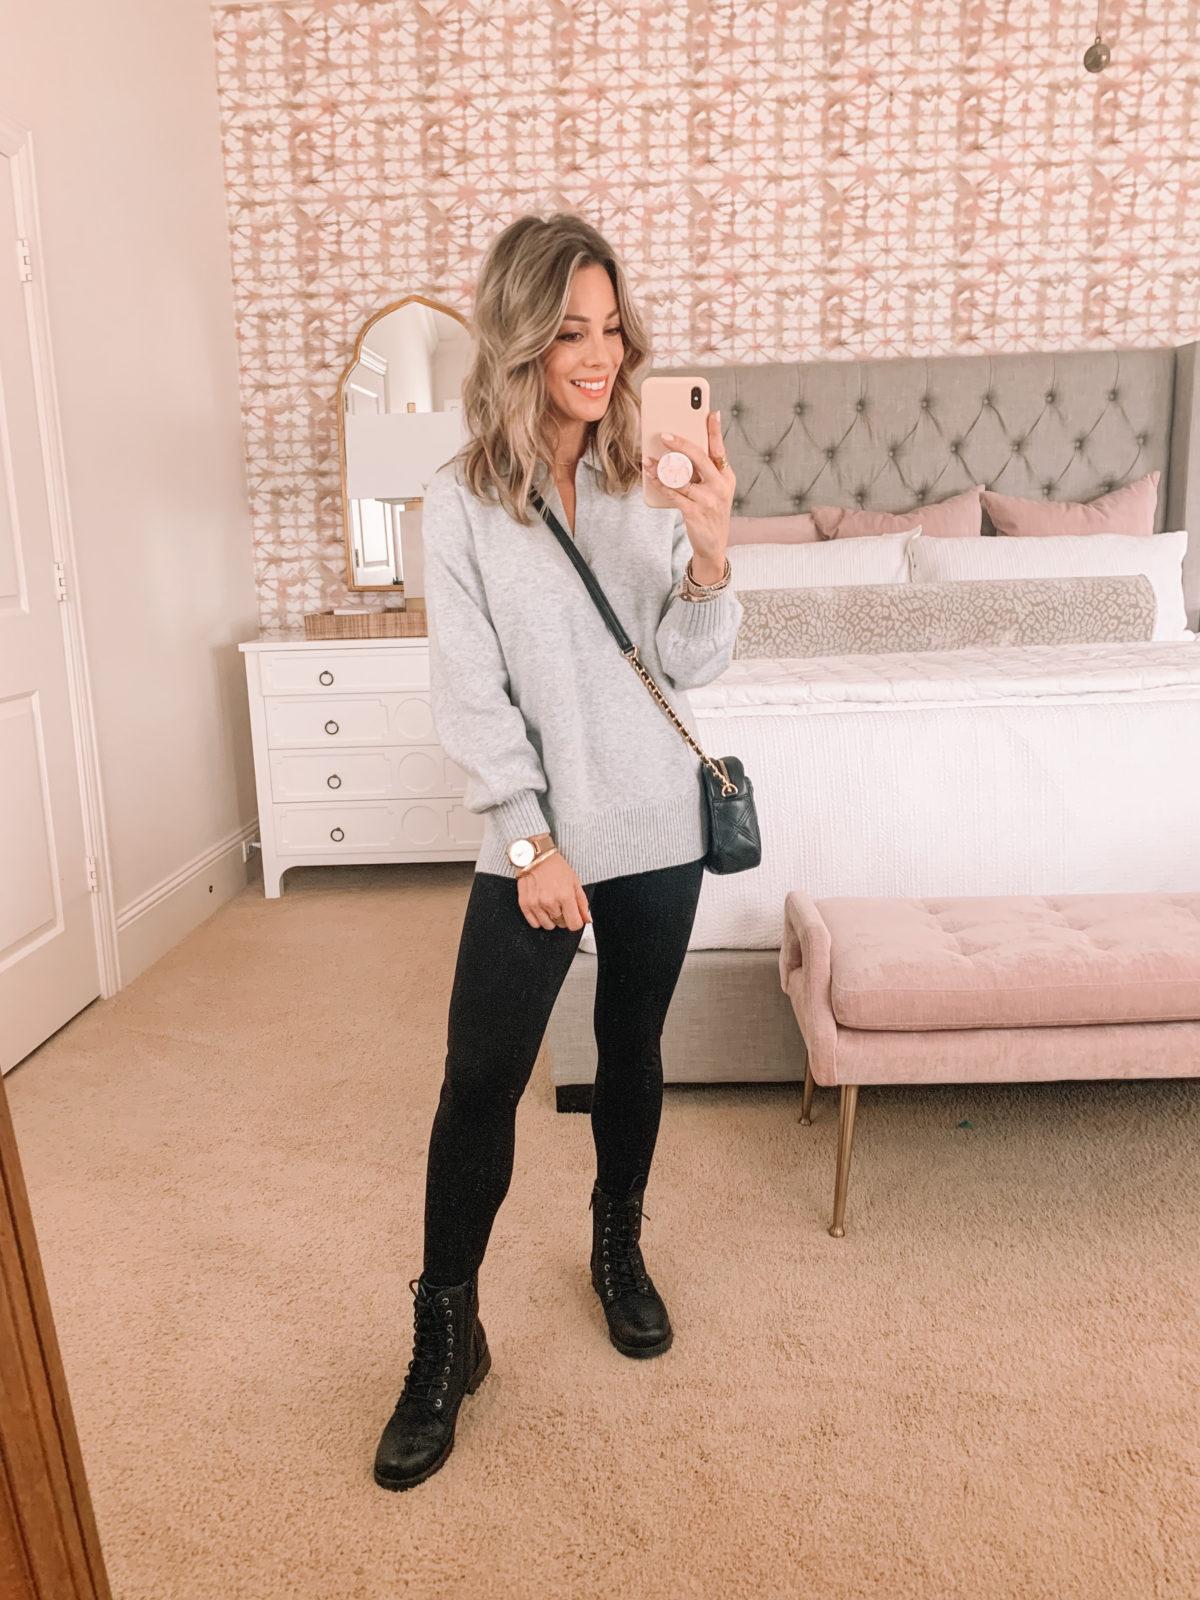 Dressing Room Finds Tunic Top, Leggings, Combat Boots, Crossbody